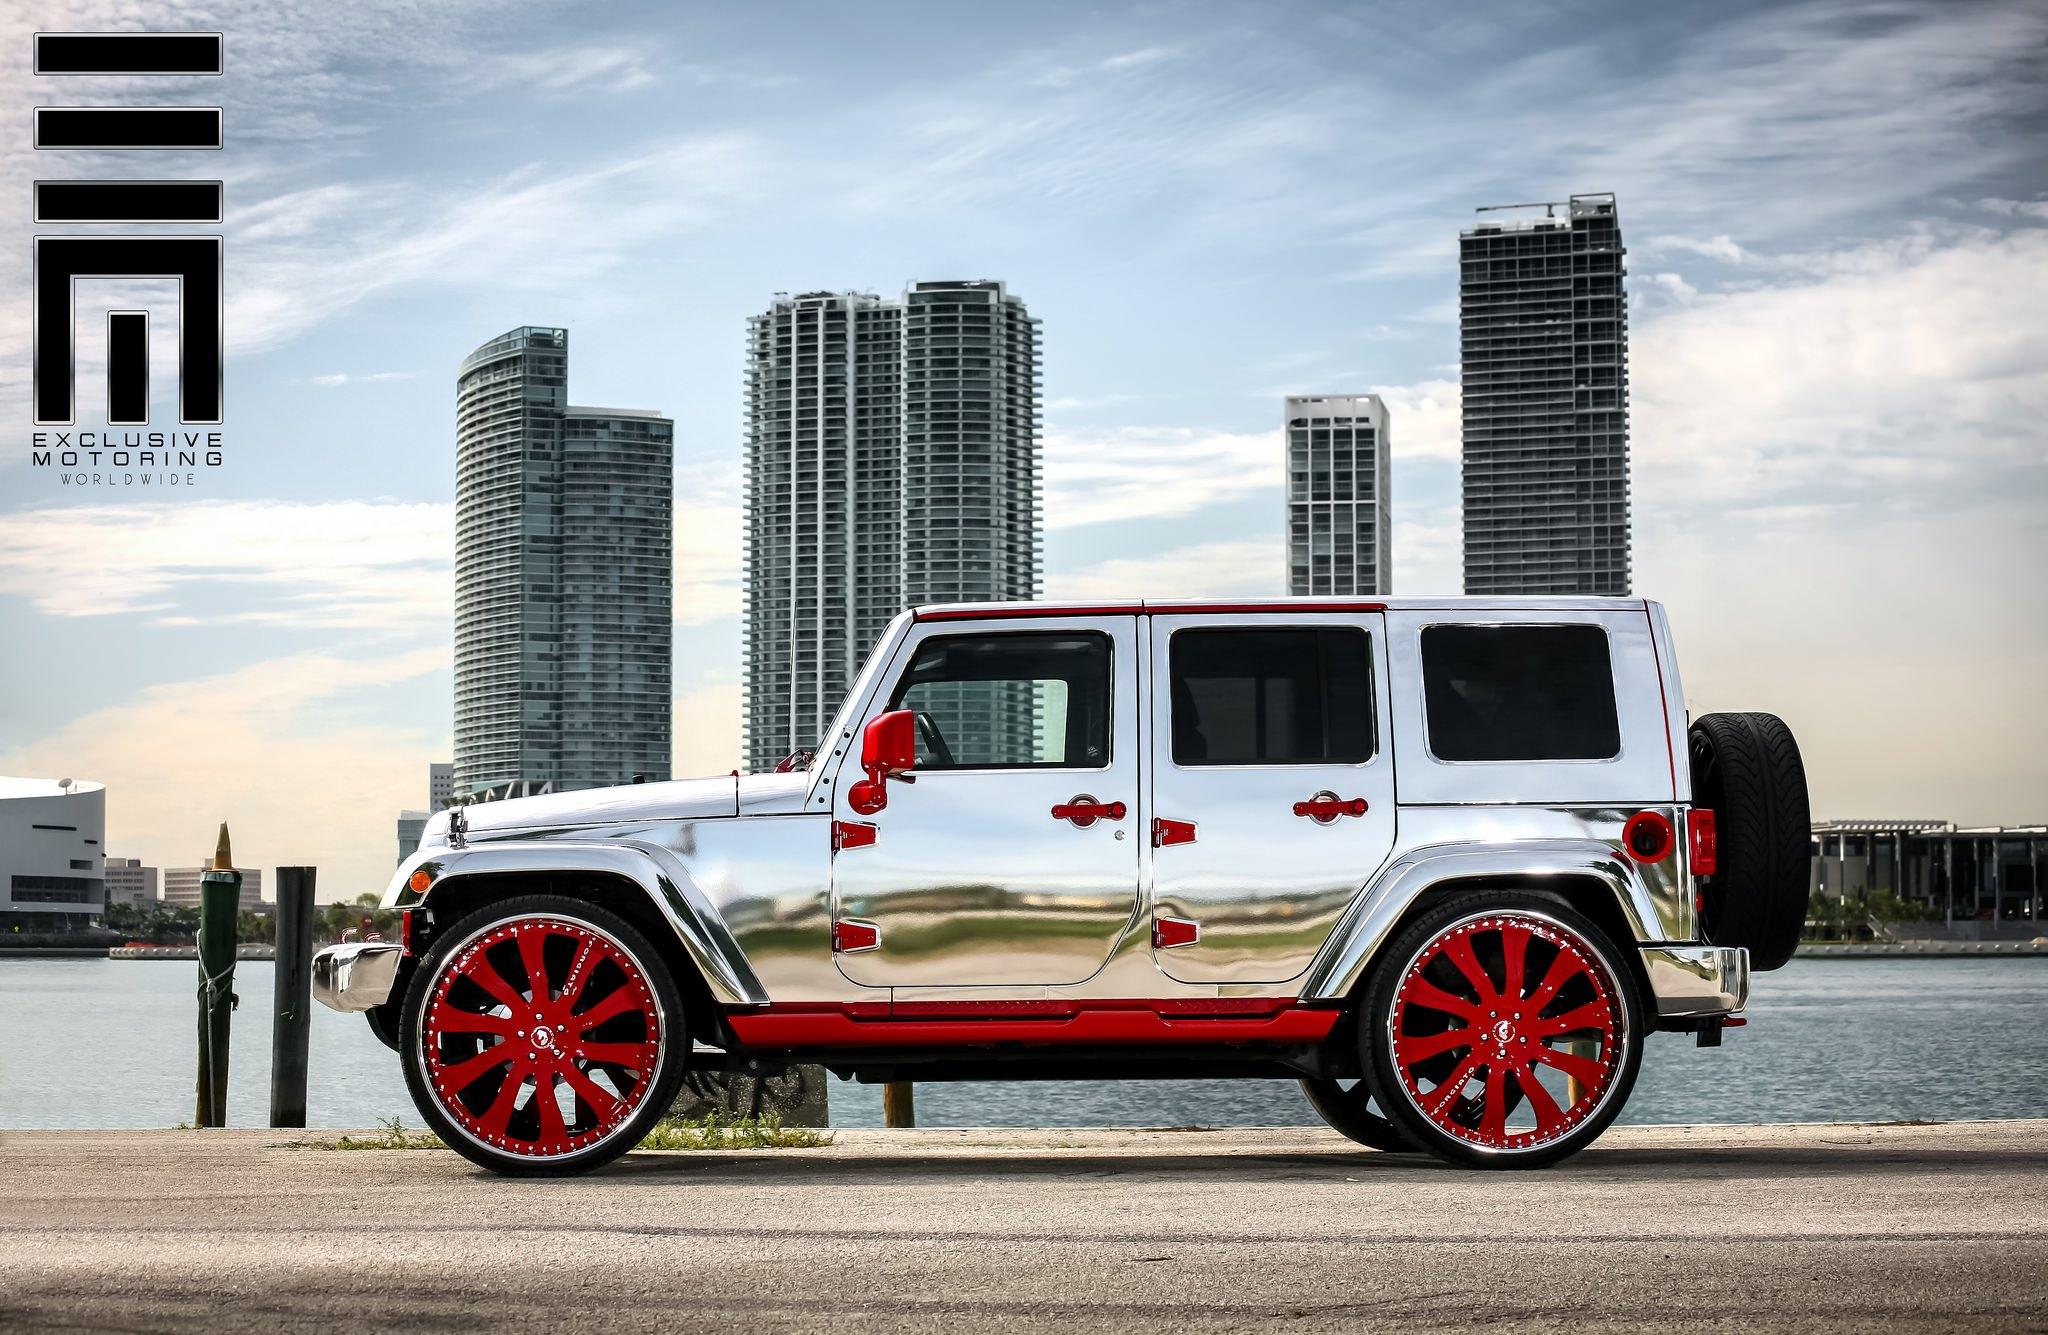 Jeep Jk Tires >> Attention Grabber Jeep JK With a Chrome Vinyl Wrap — CARiD.com Gallery